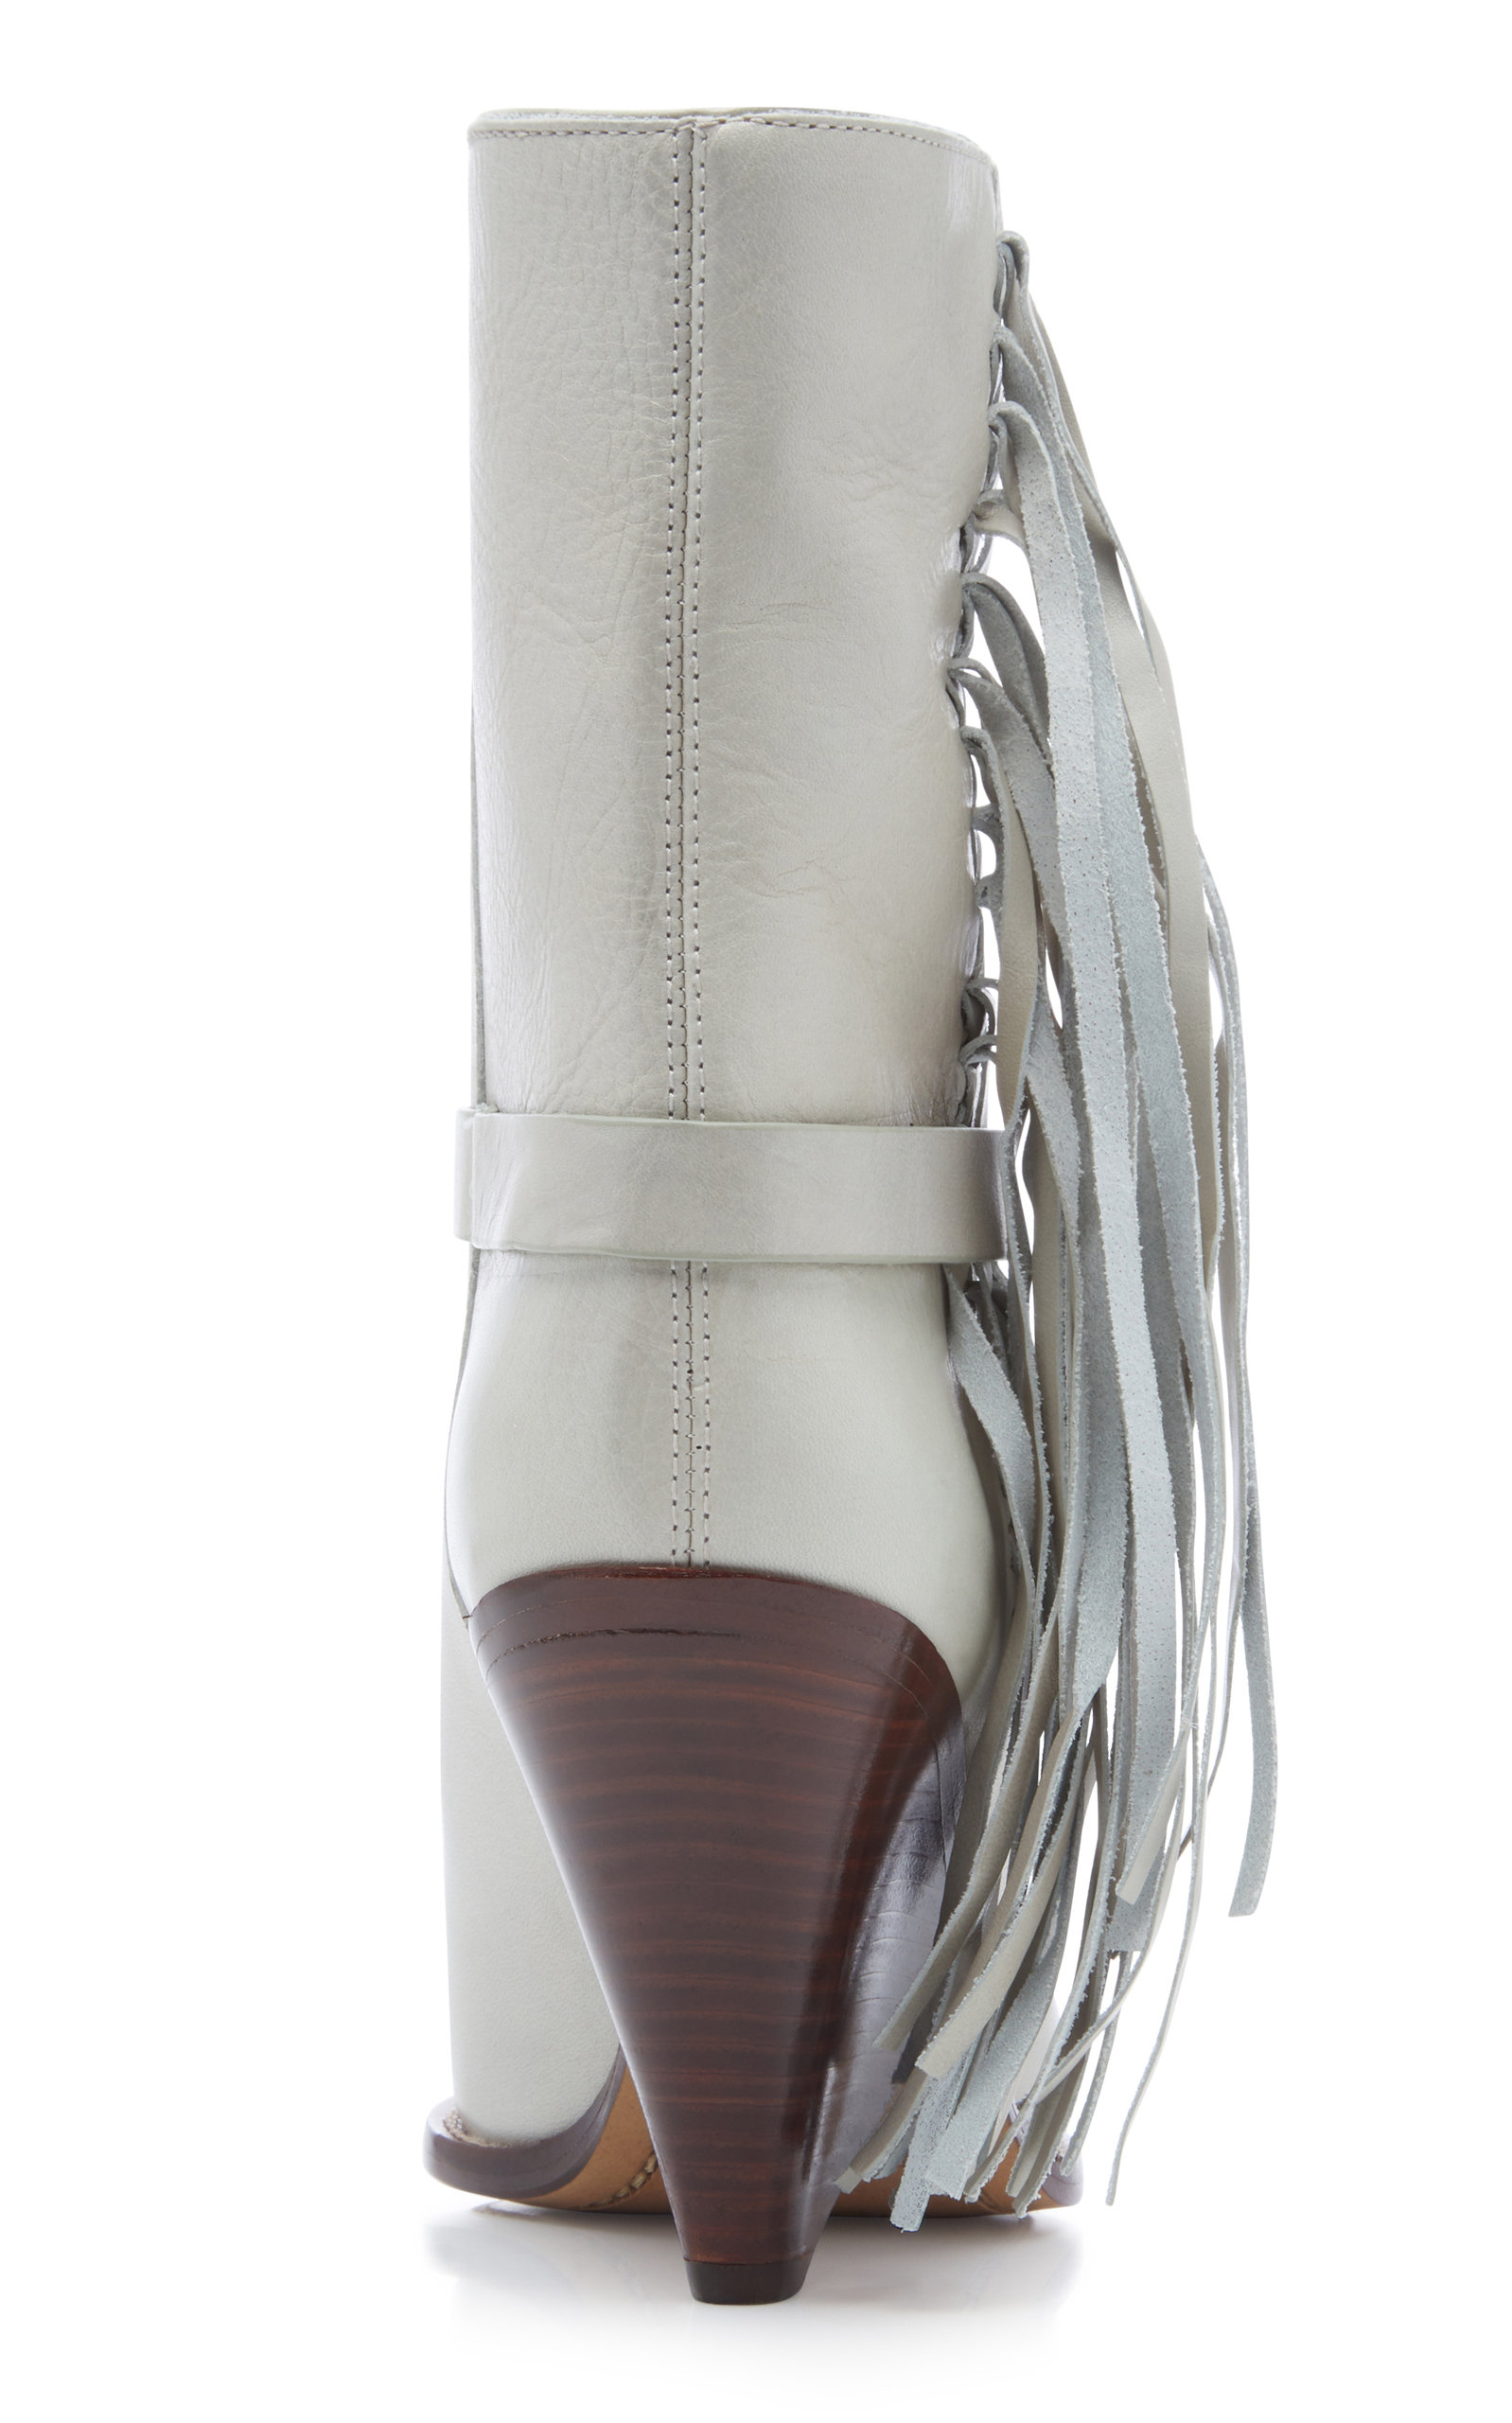 Ankle Loffen White Marant Modesens Boots In Leather Isabel Tasseled xBqSwfFAv